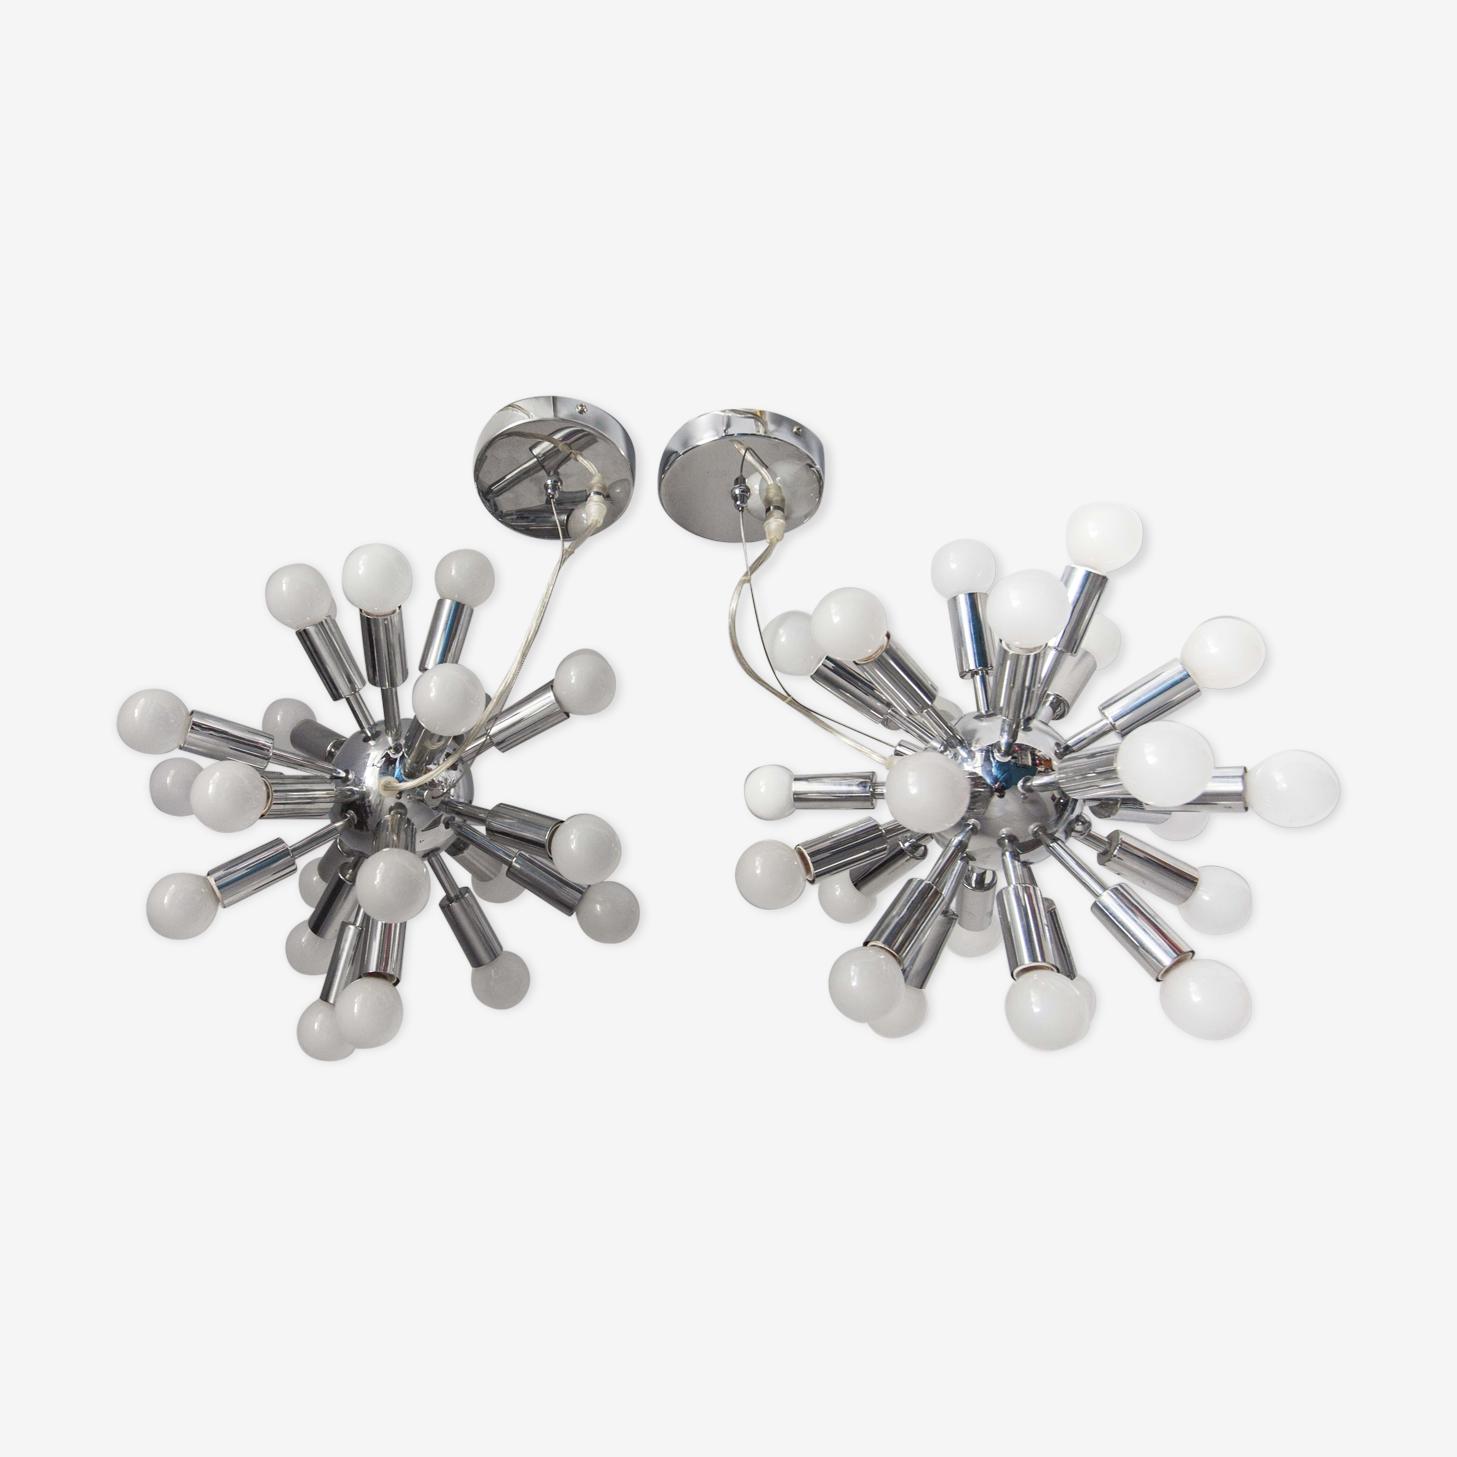 Pair of vintage chrome Sputnik chandeliers